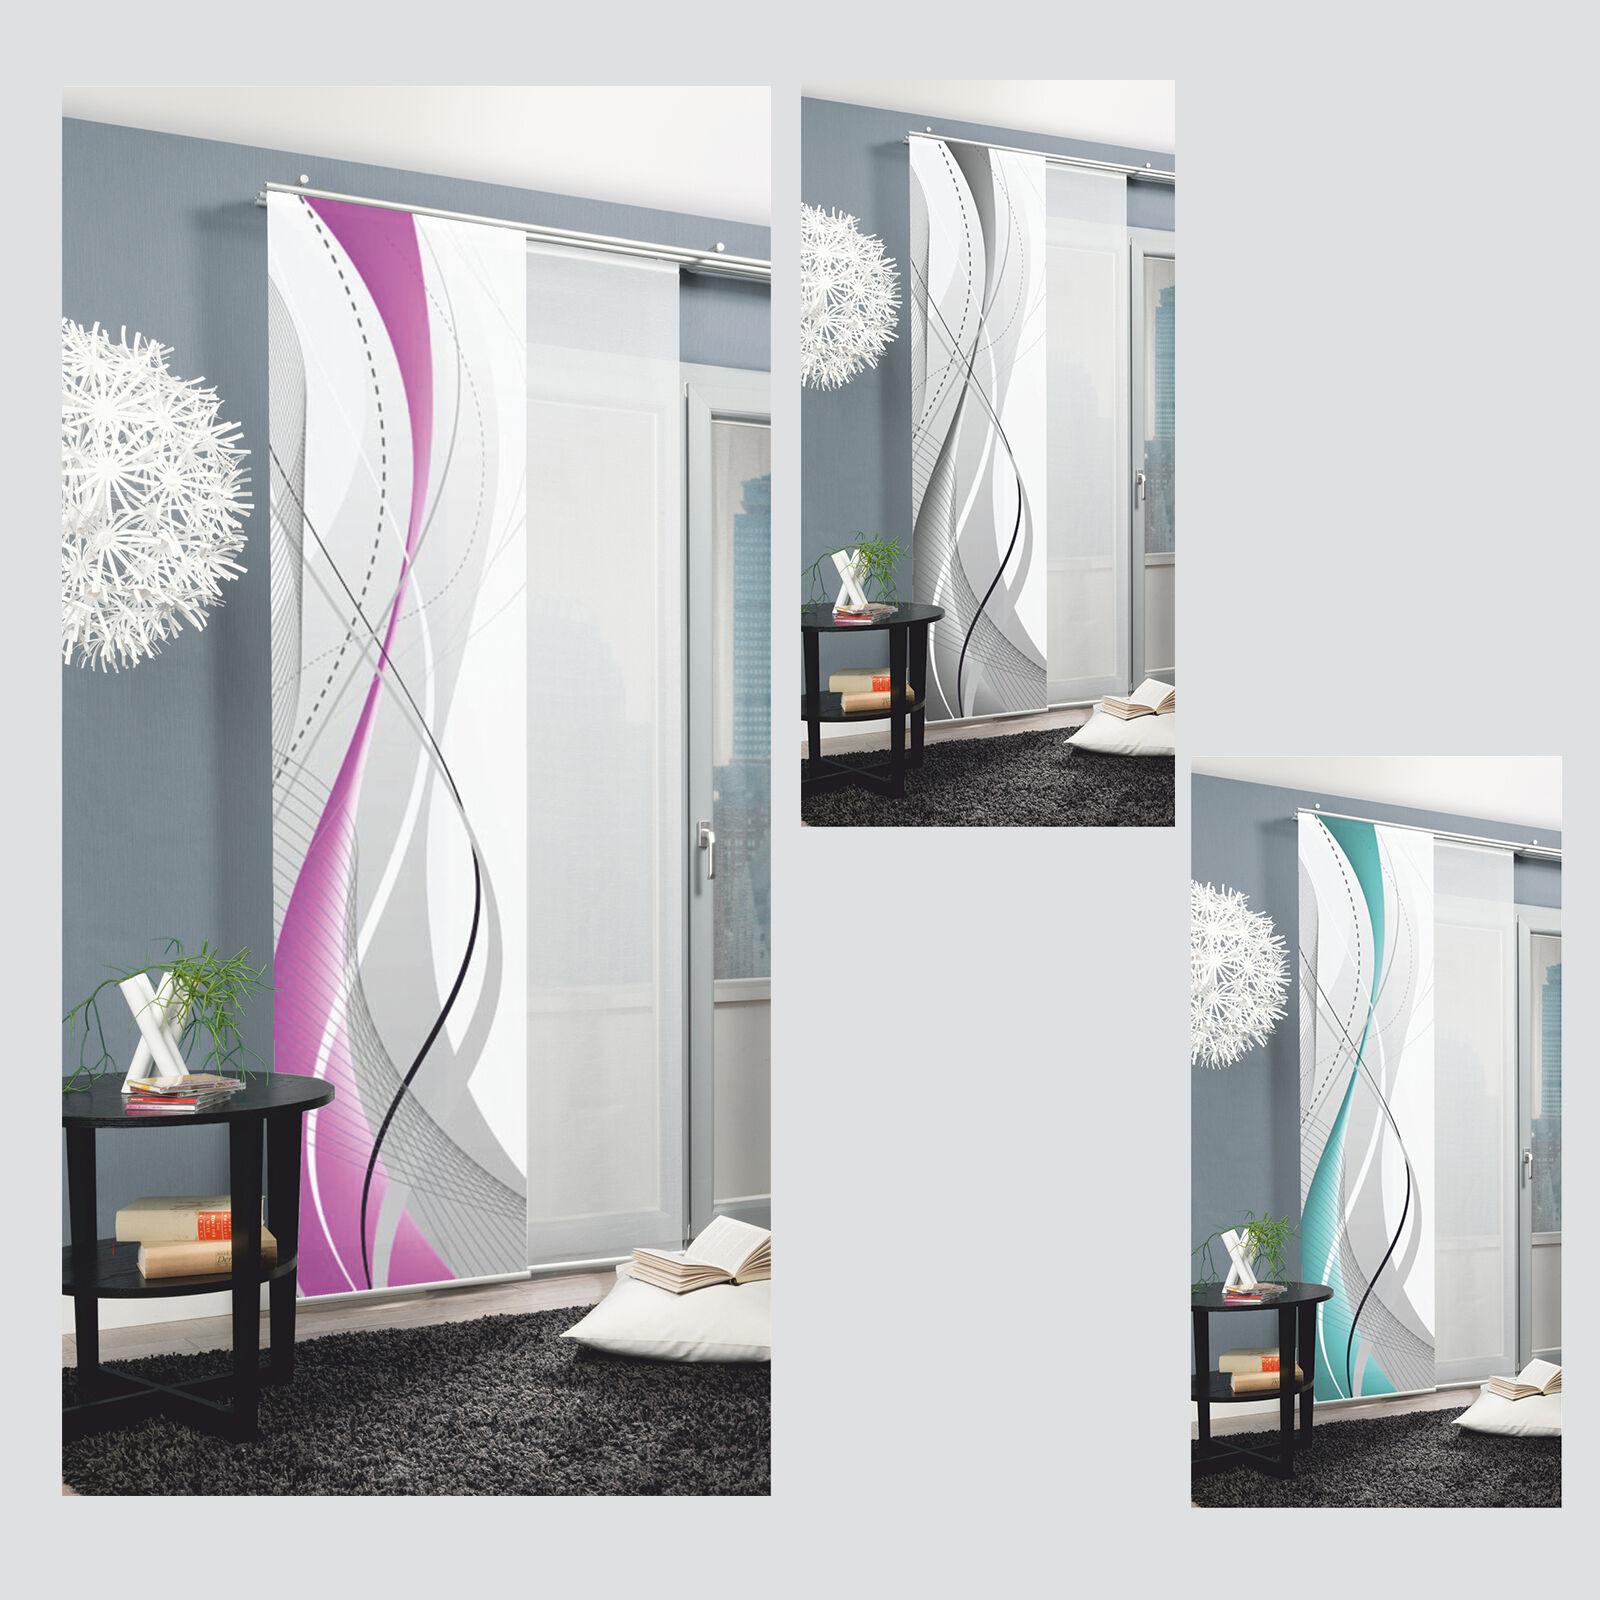 carlisle welle graphisch abstrakt schiebevorhang raumteiler digital home wohnide ebay. Black Bedroom Furniture Sets. Home Design Ideas